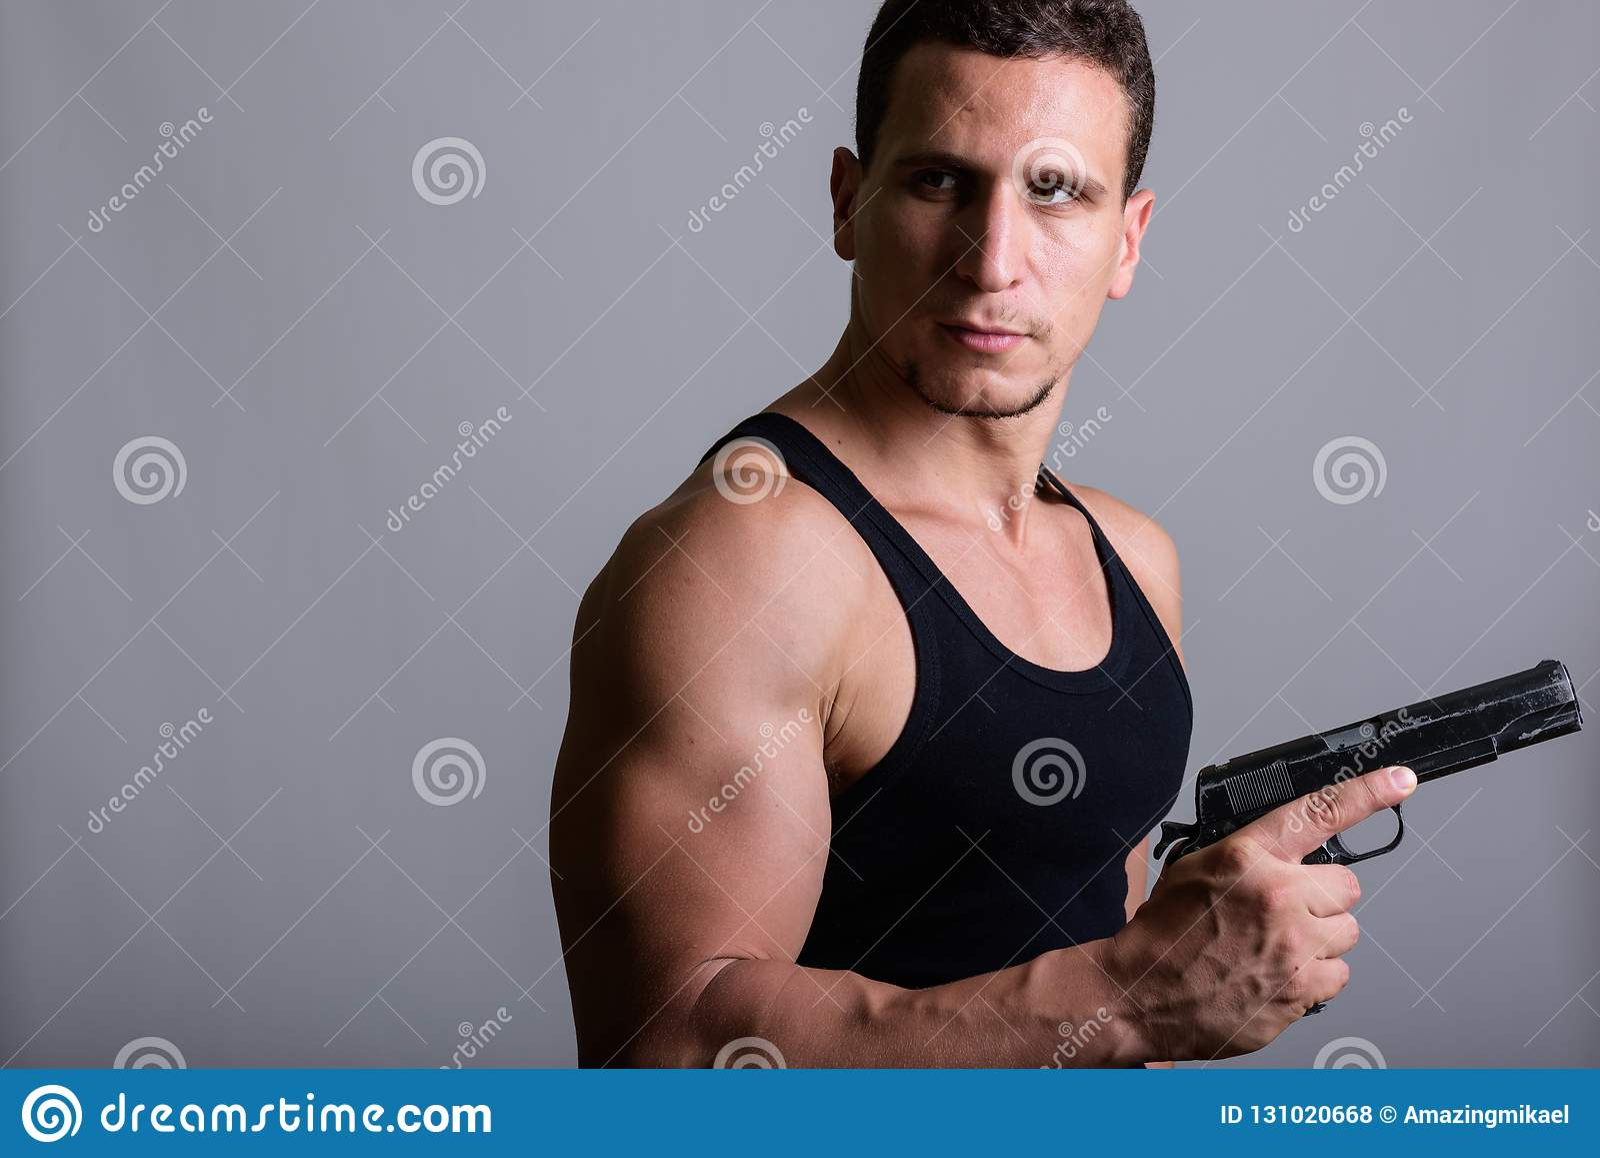 Men Military Shirtless Gun Stock Photos, Pictures